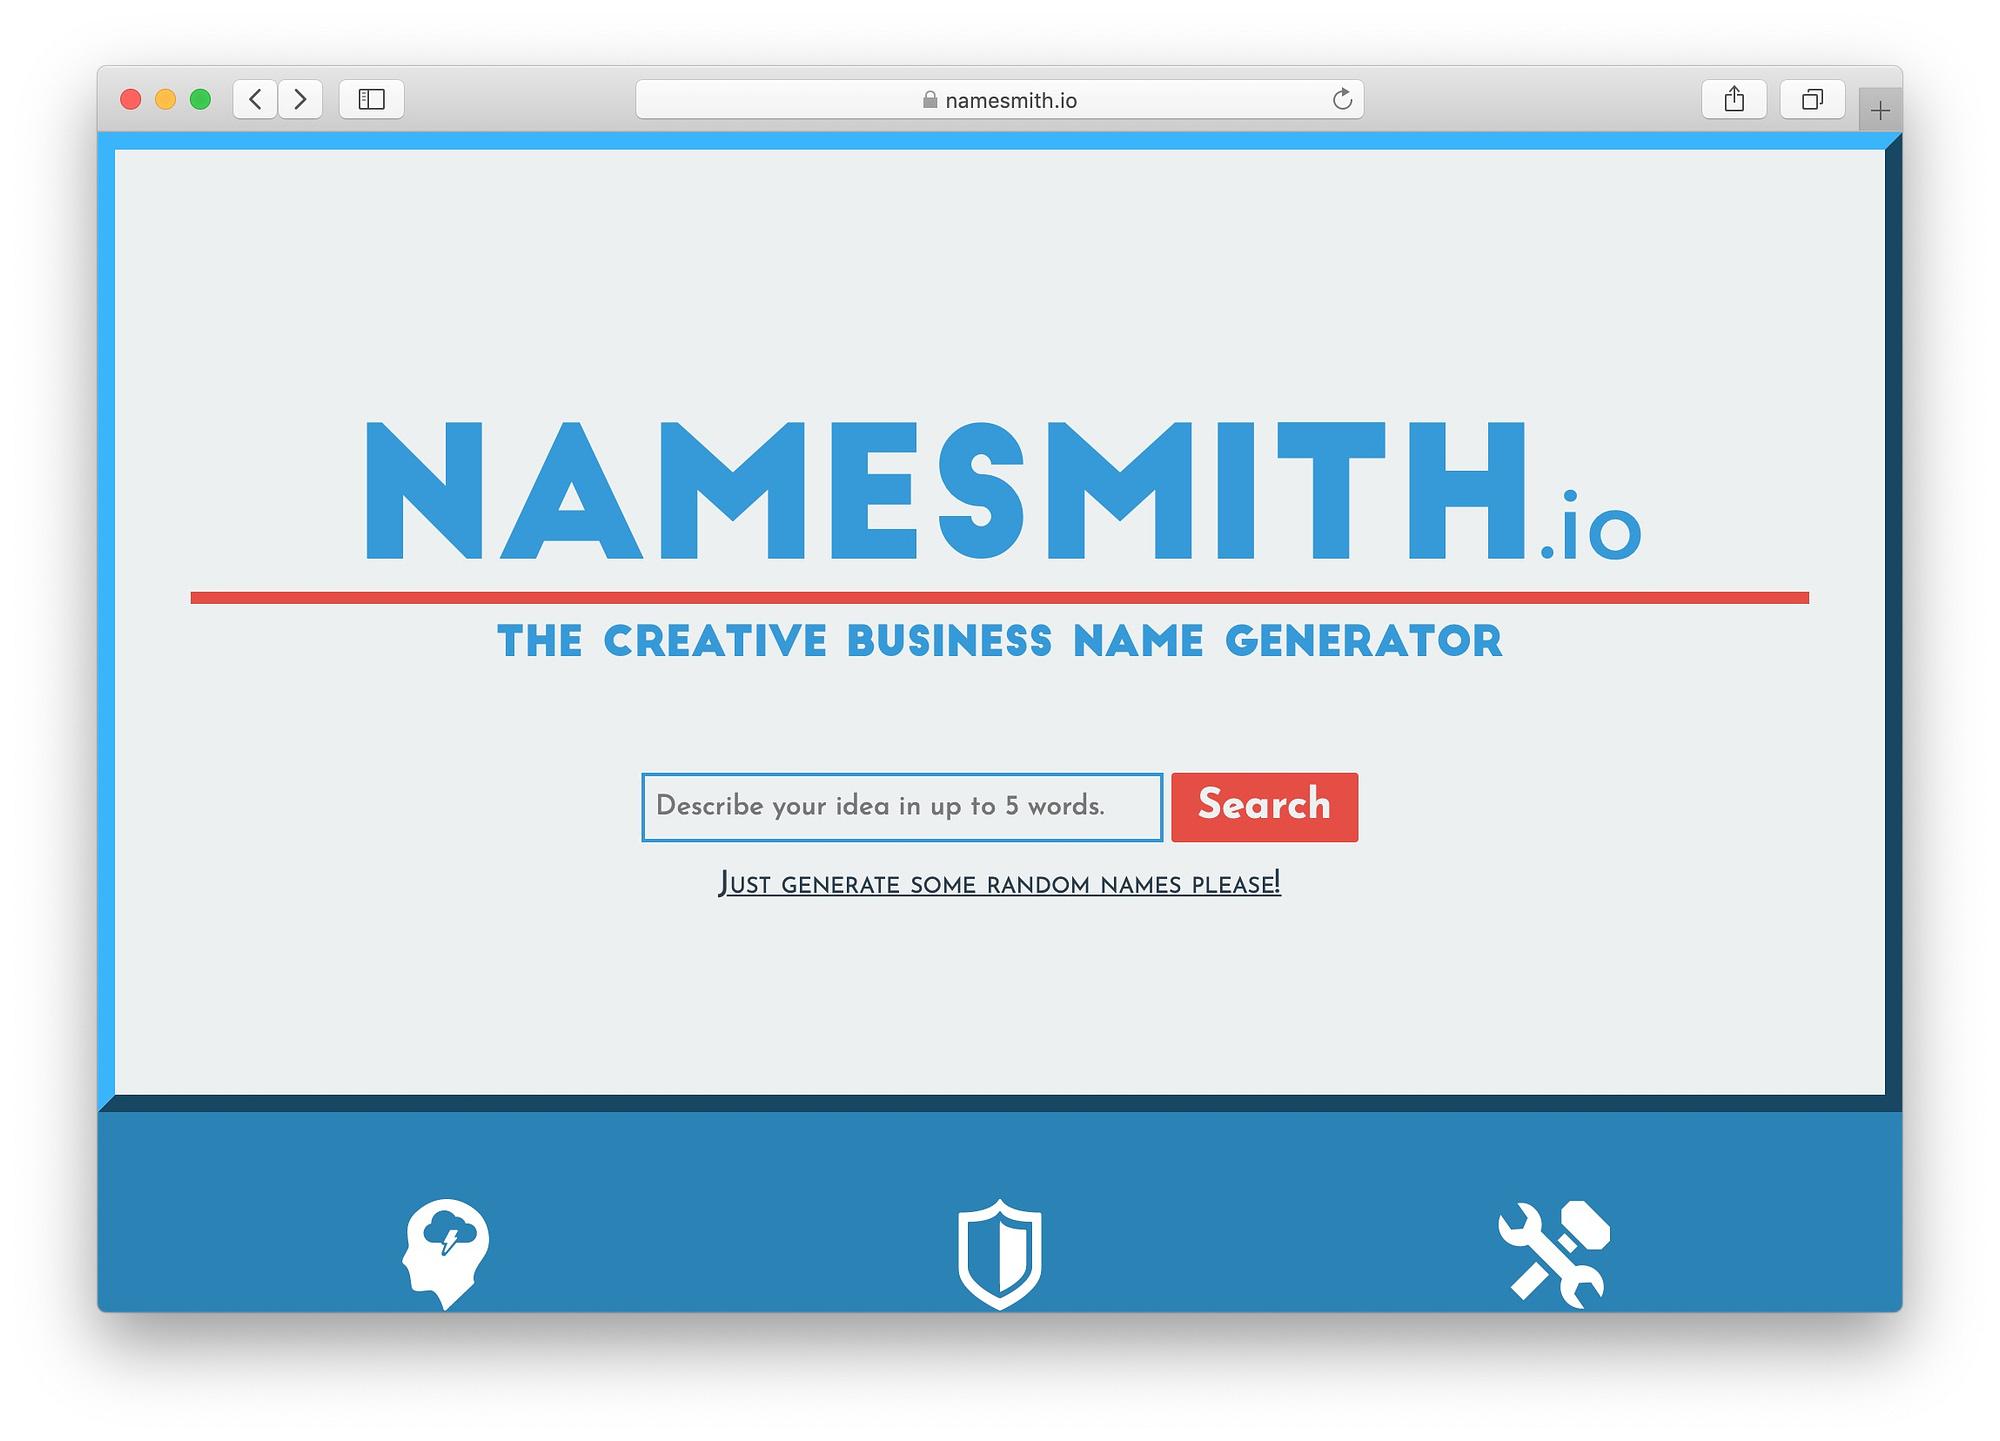 Best free business name generators: NameSmith